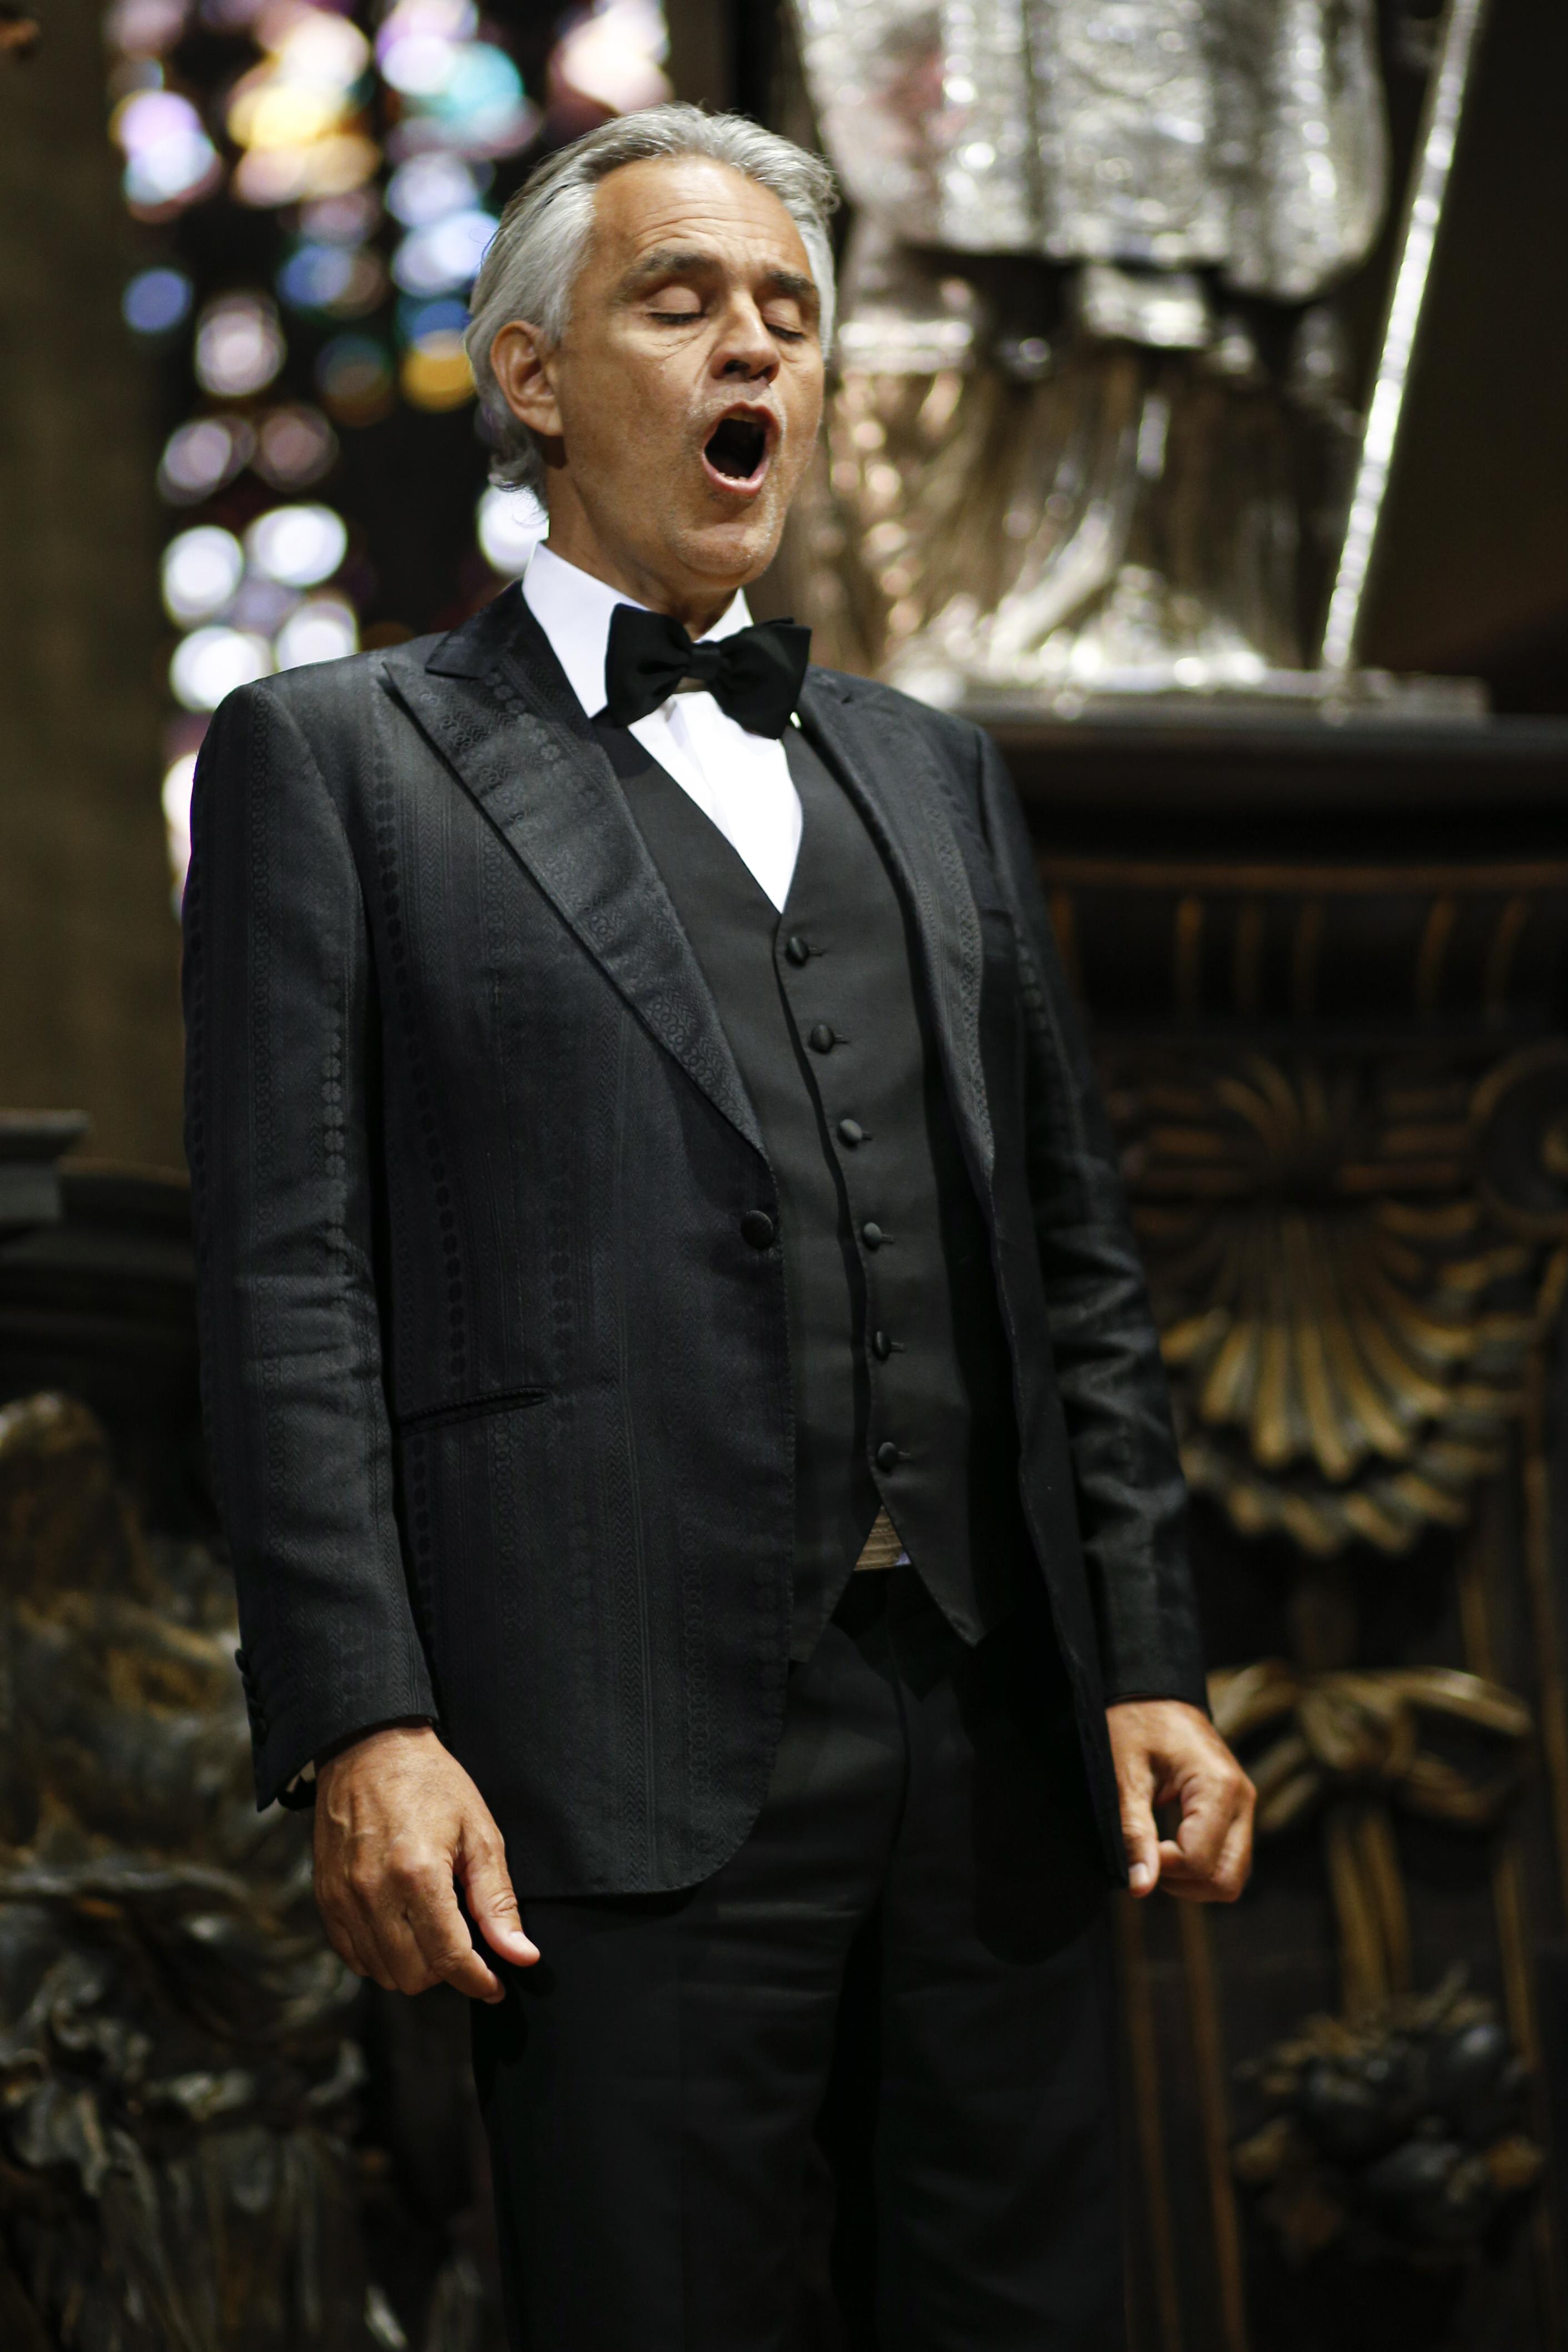 Bocelli Duomo 6 credit LUCA ROSSETTI COURTESY SUGAR SRL DECCA RECORDS Andrea Bocelli Releases Full Easter Sunday Concert Video: Watch